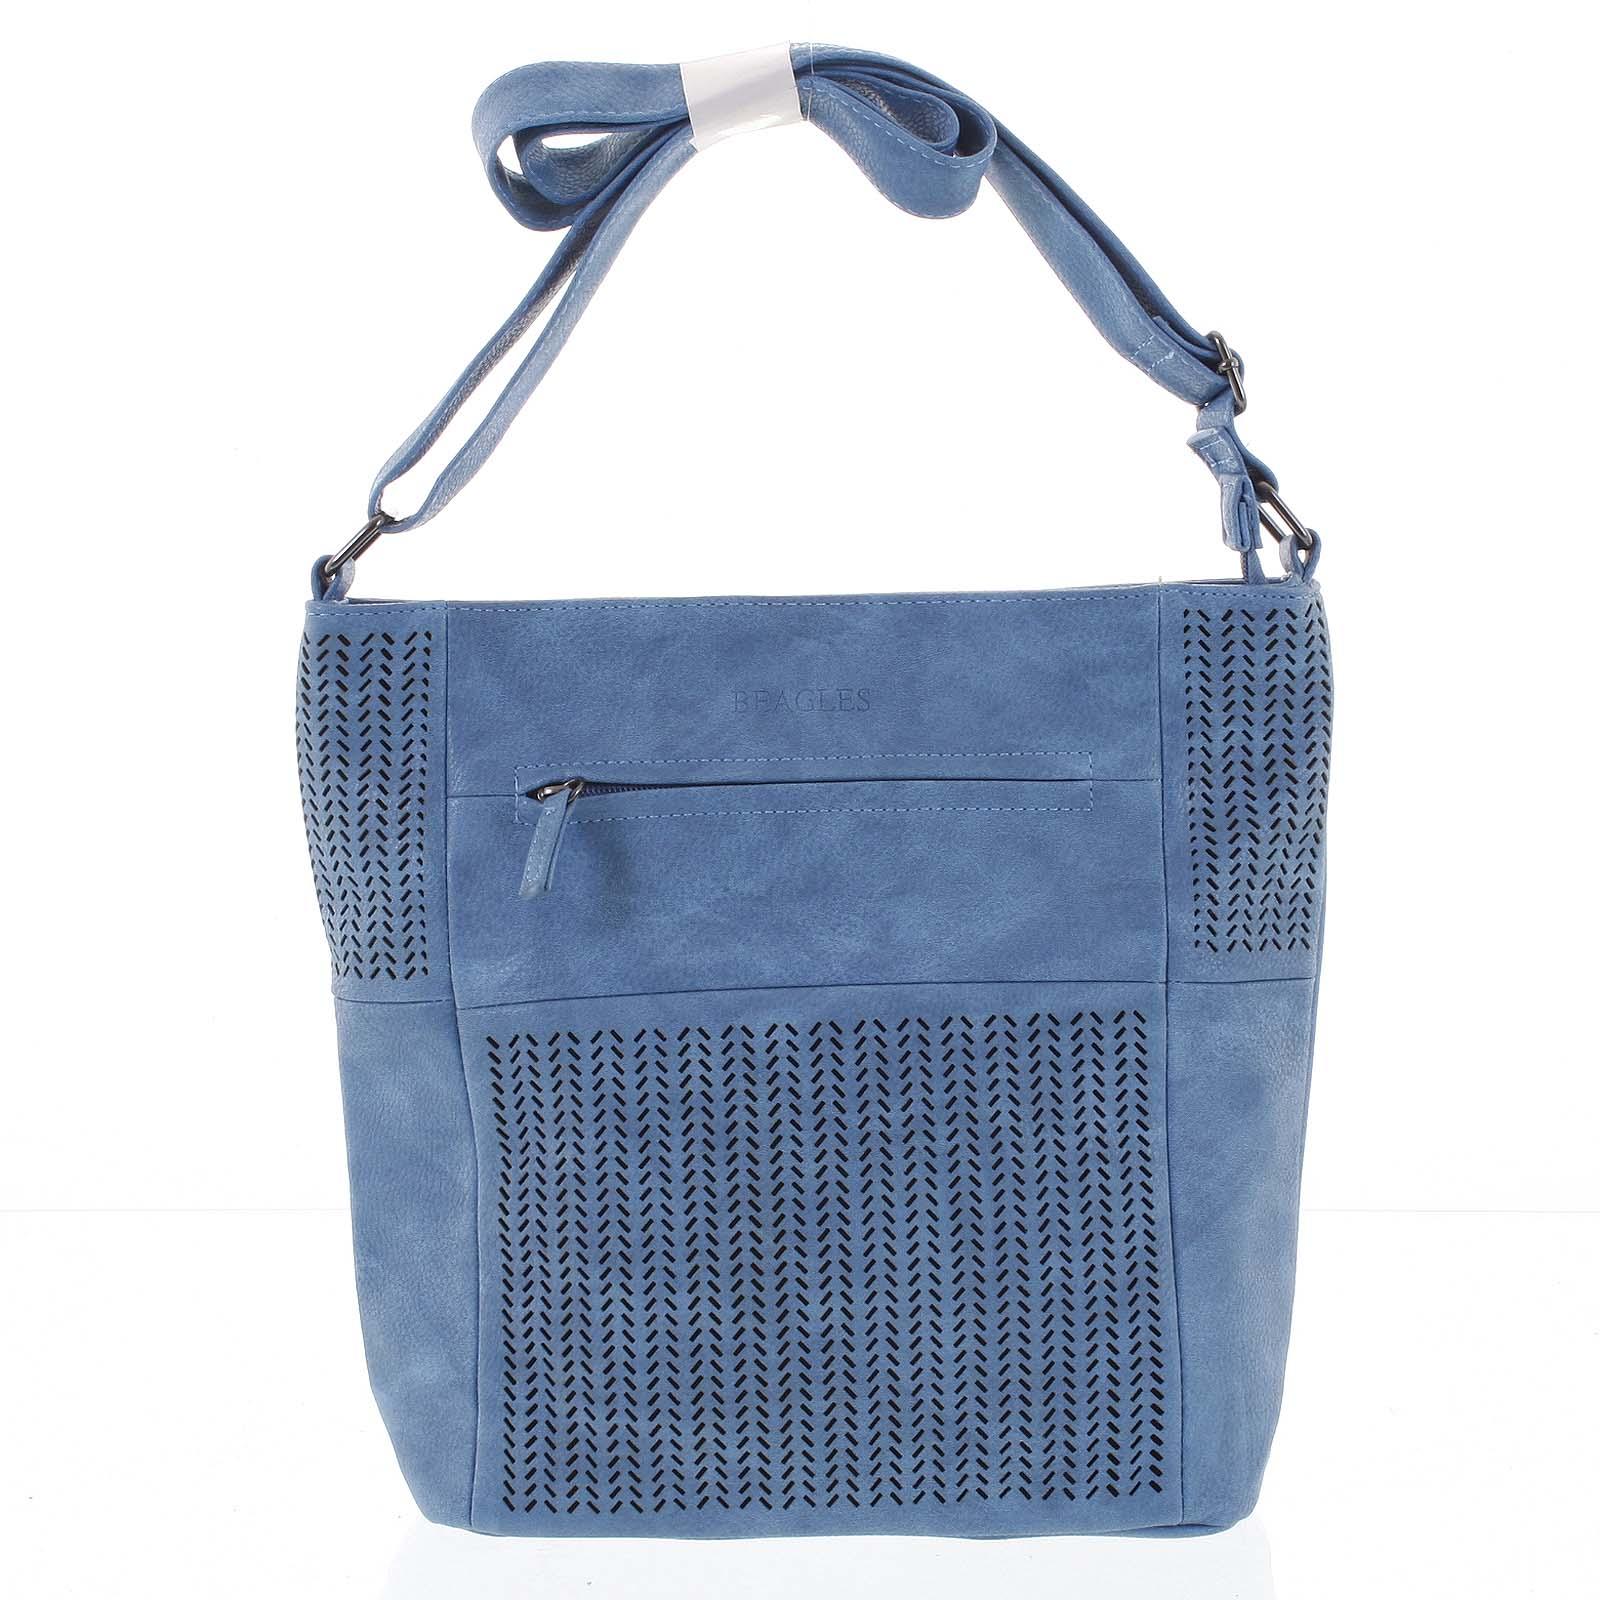 6edcffb5da Stredná trendy perforovaná crossbody kabelka modrá - Beagles ...